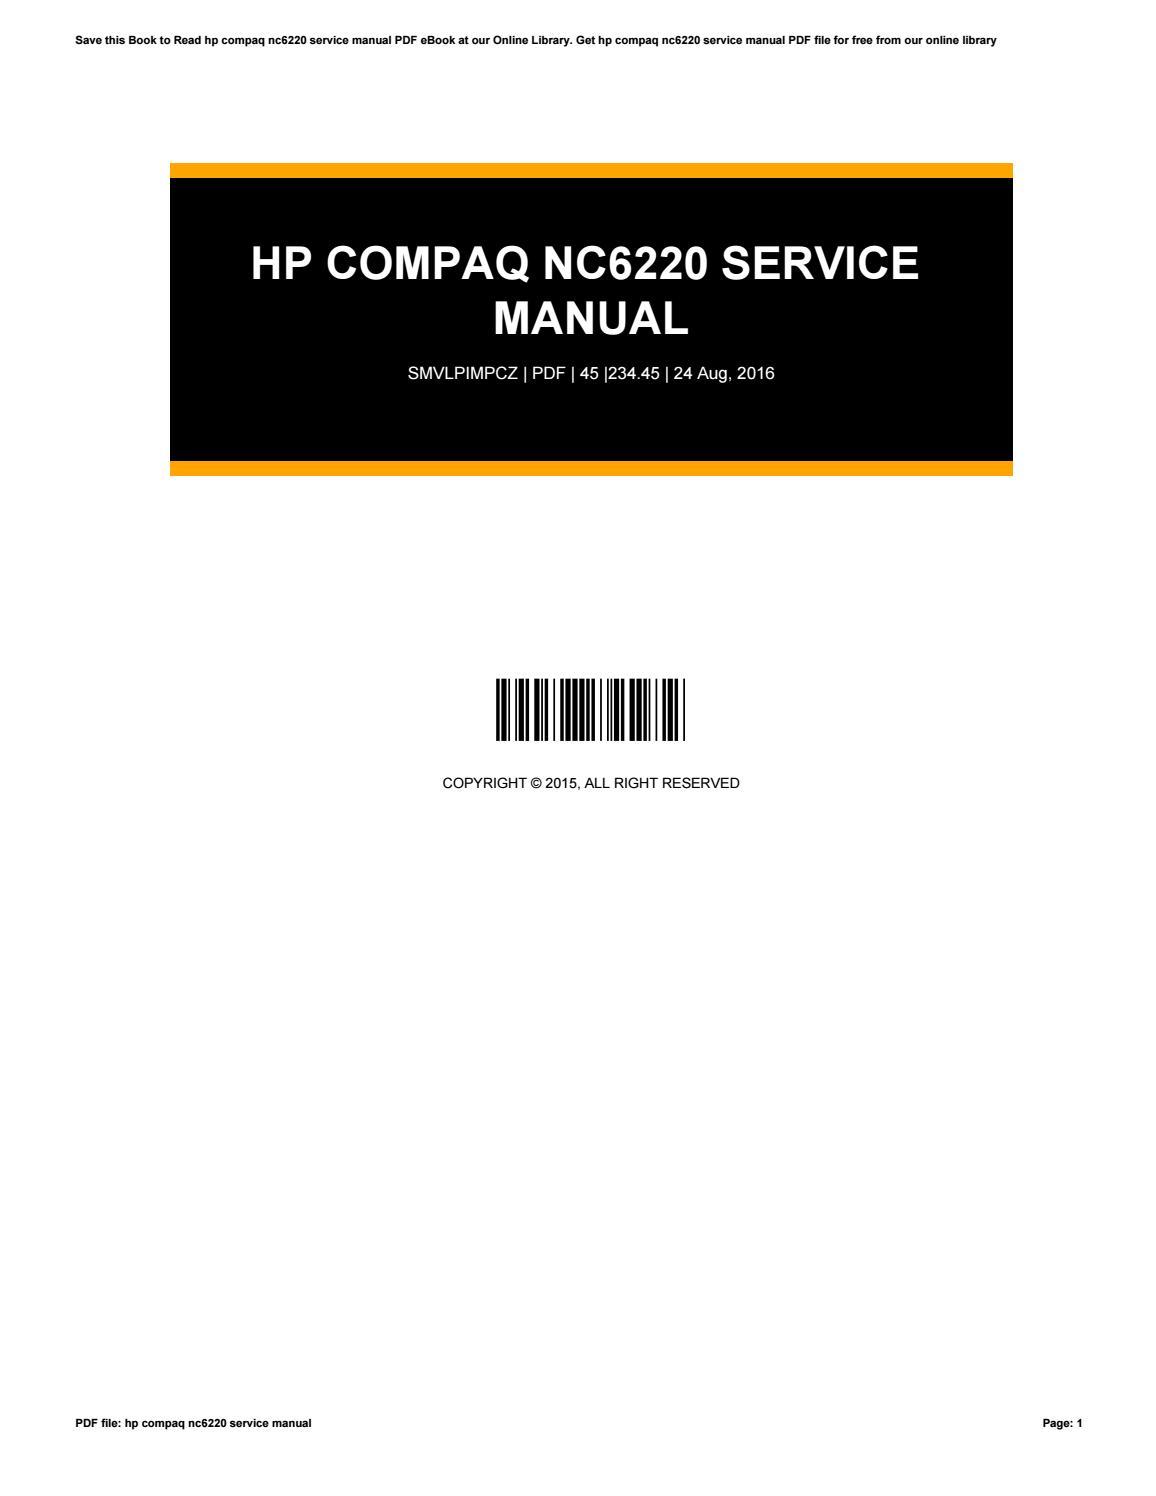 hp compaq nc6220 service manual by karl issuu rh issuu com HP Compaq Nc6320 hp compaq nc6220 repair manual